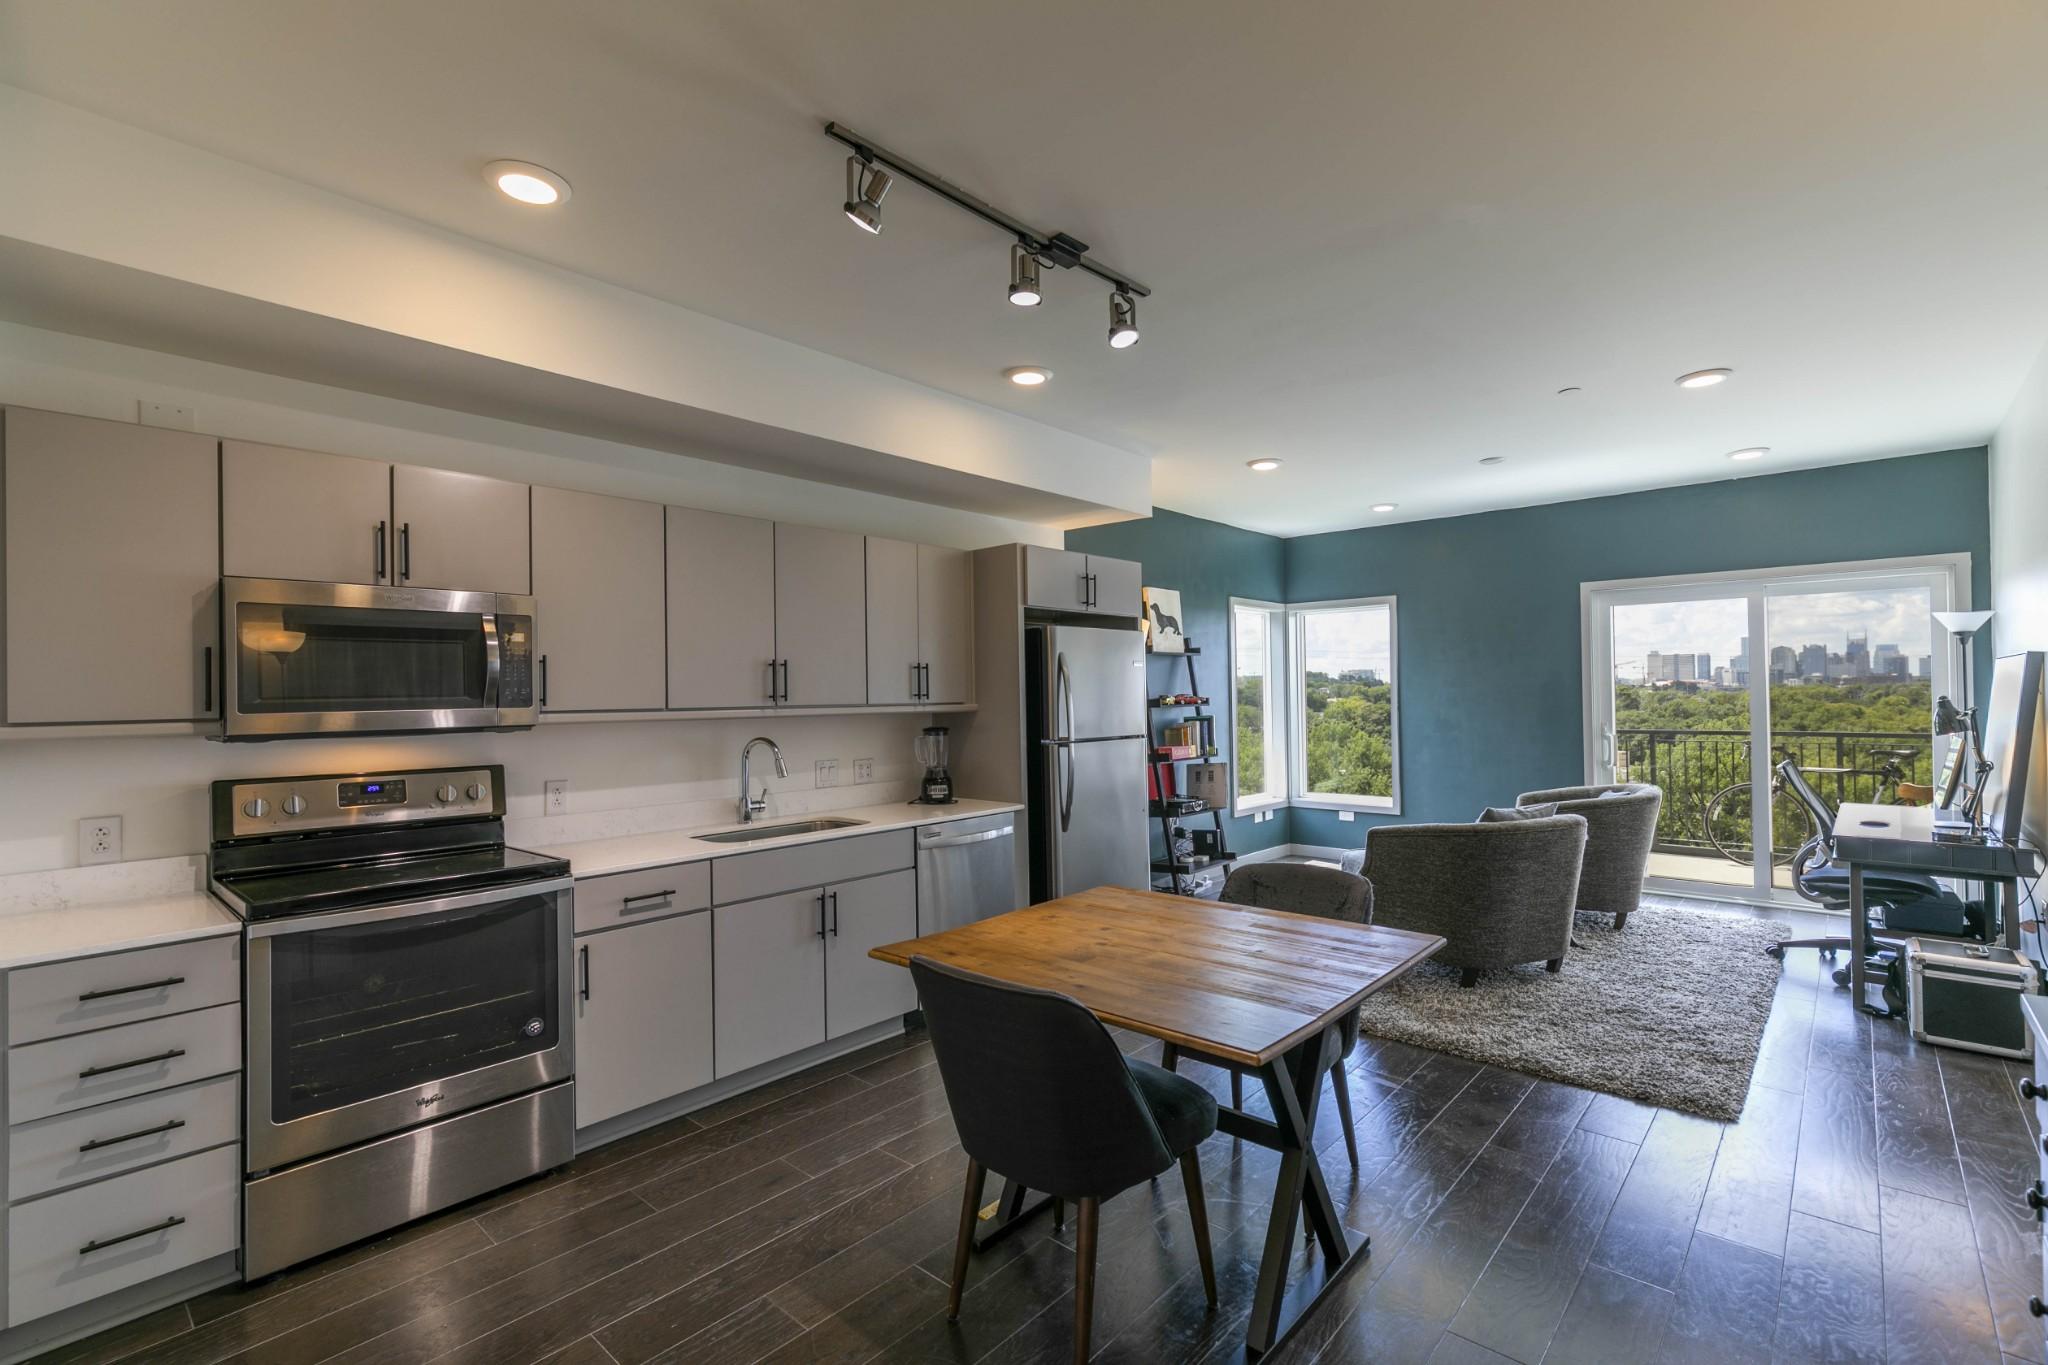 400 Herron Dr #403 Property Photo - Nashville, TN real estate listing